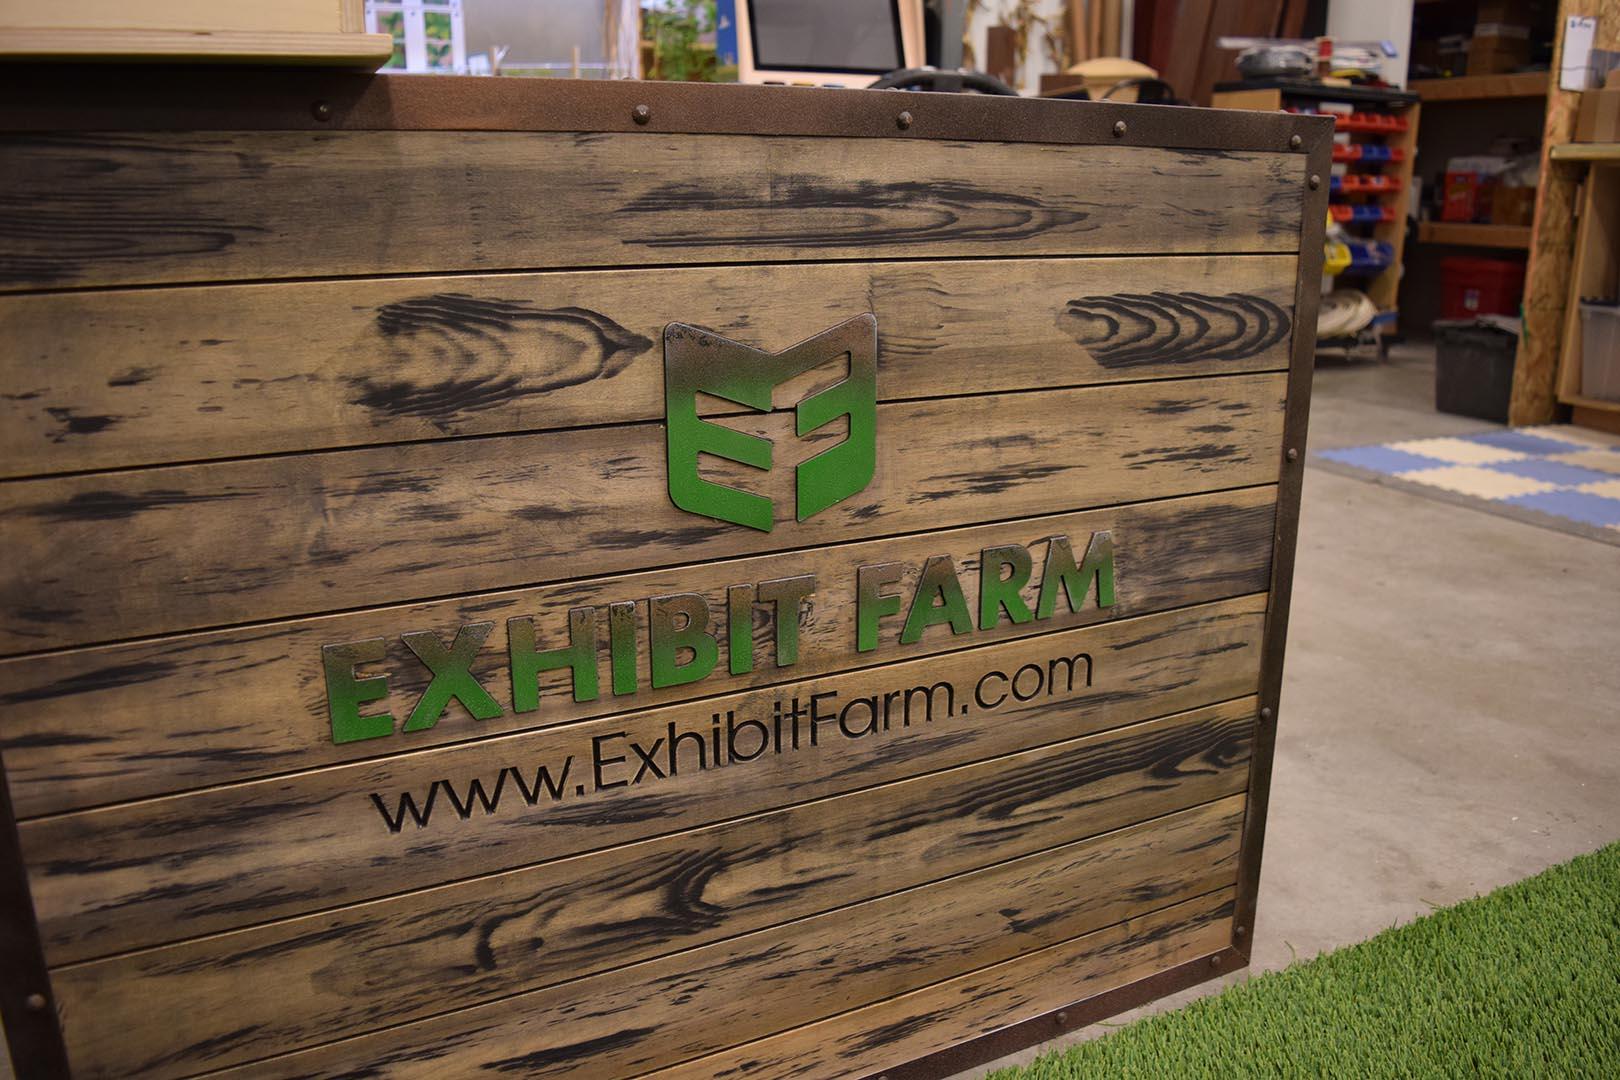 Exhibit Farm Display Crate